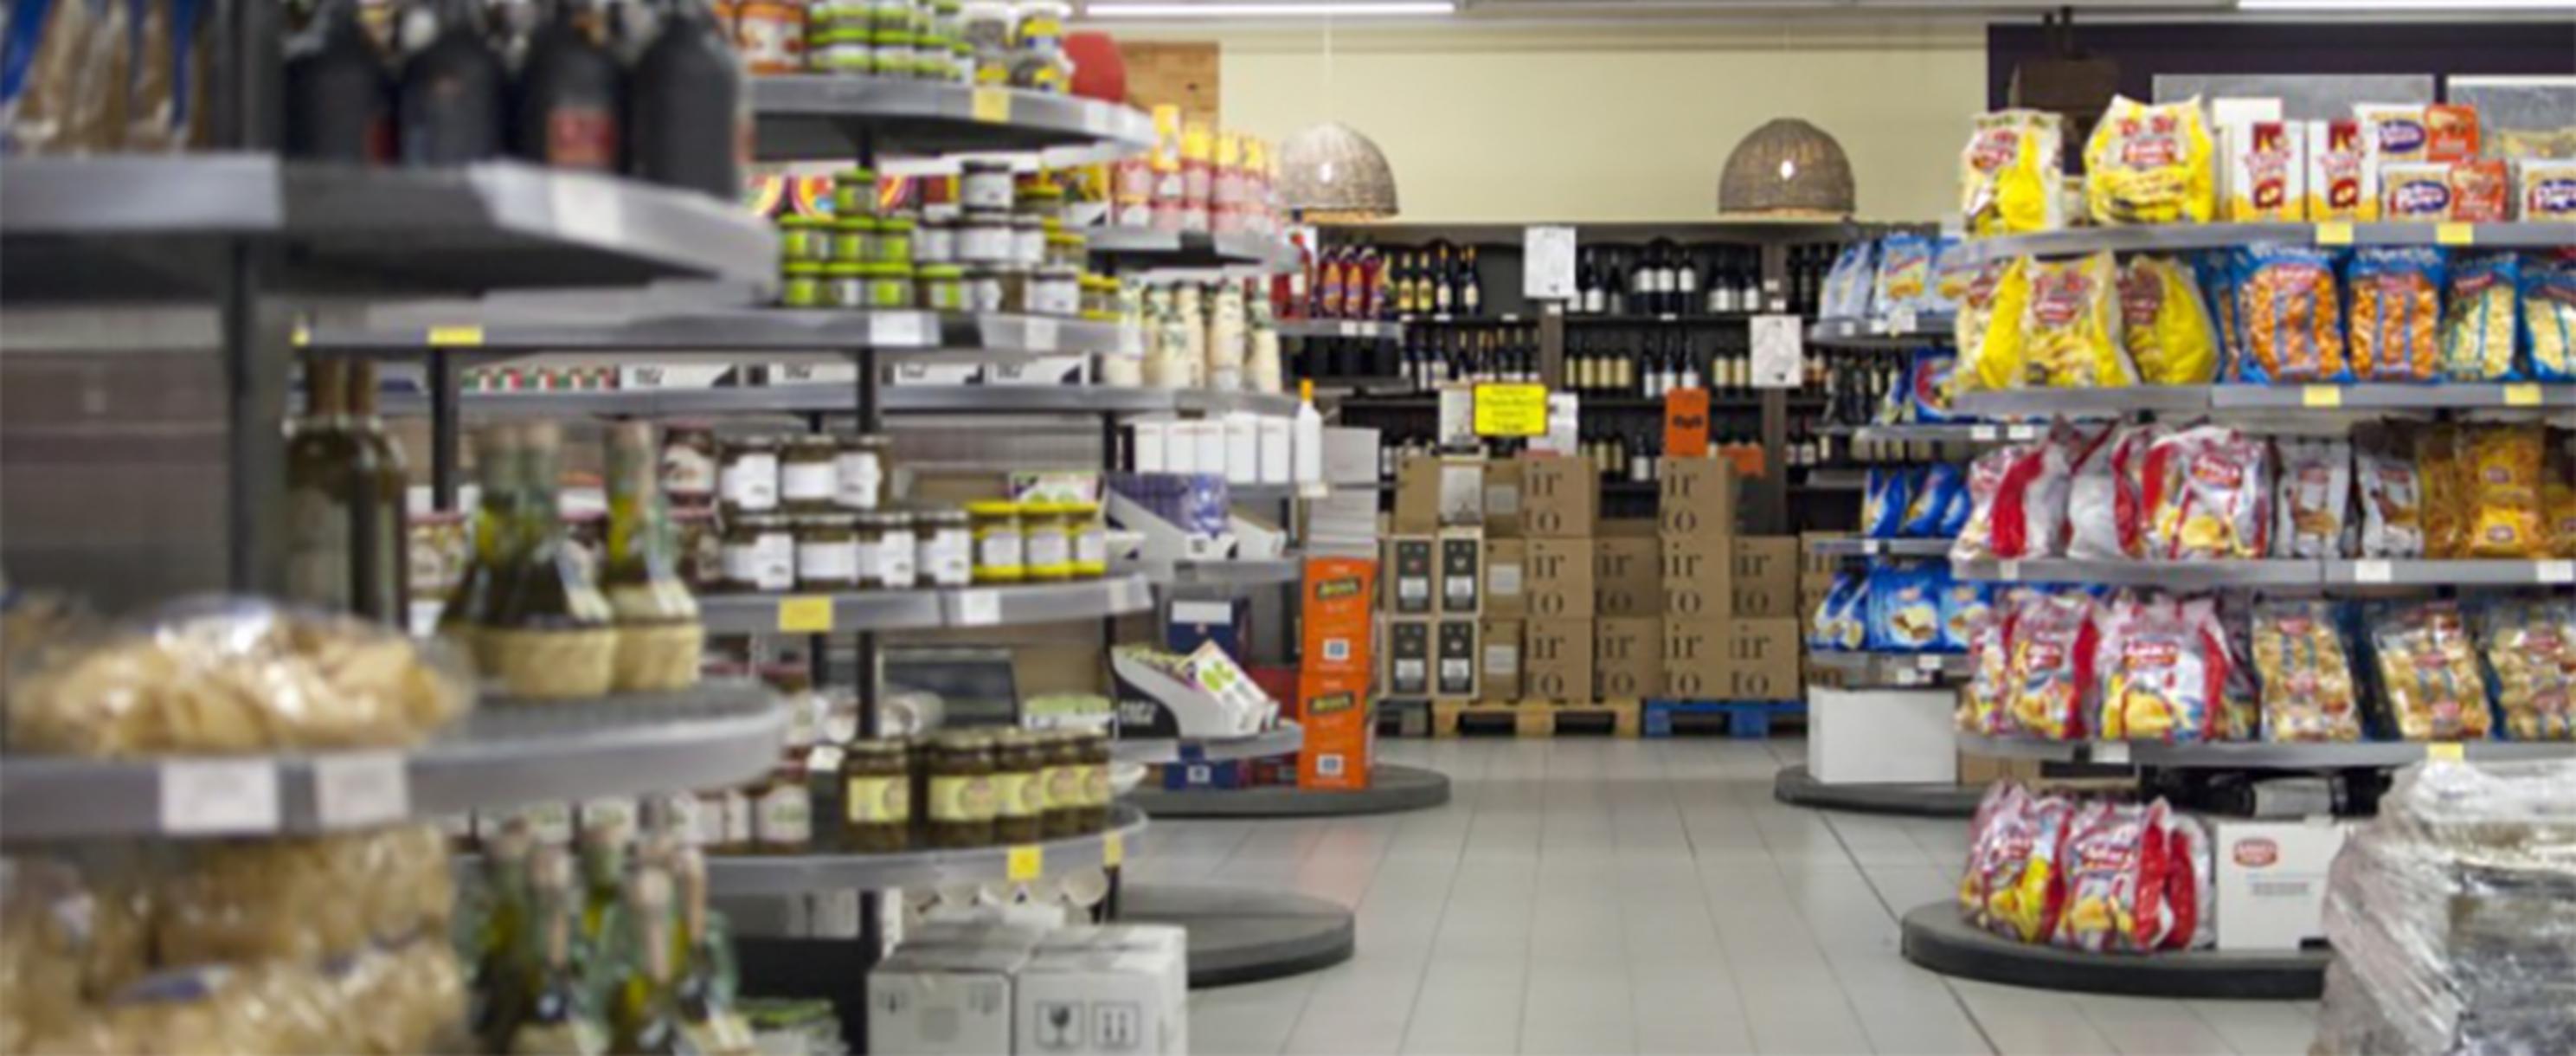 italienischer supermarkt berlin